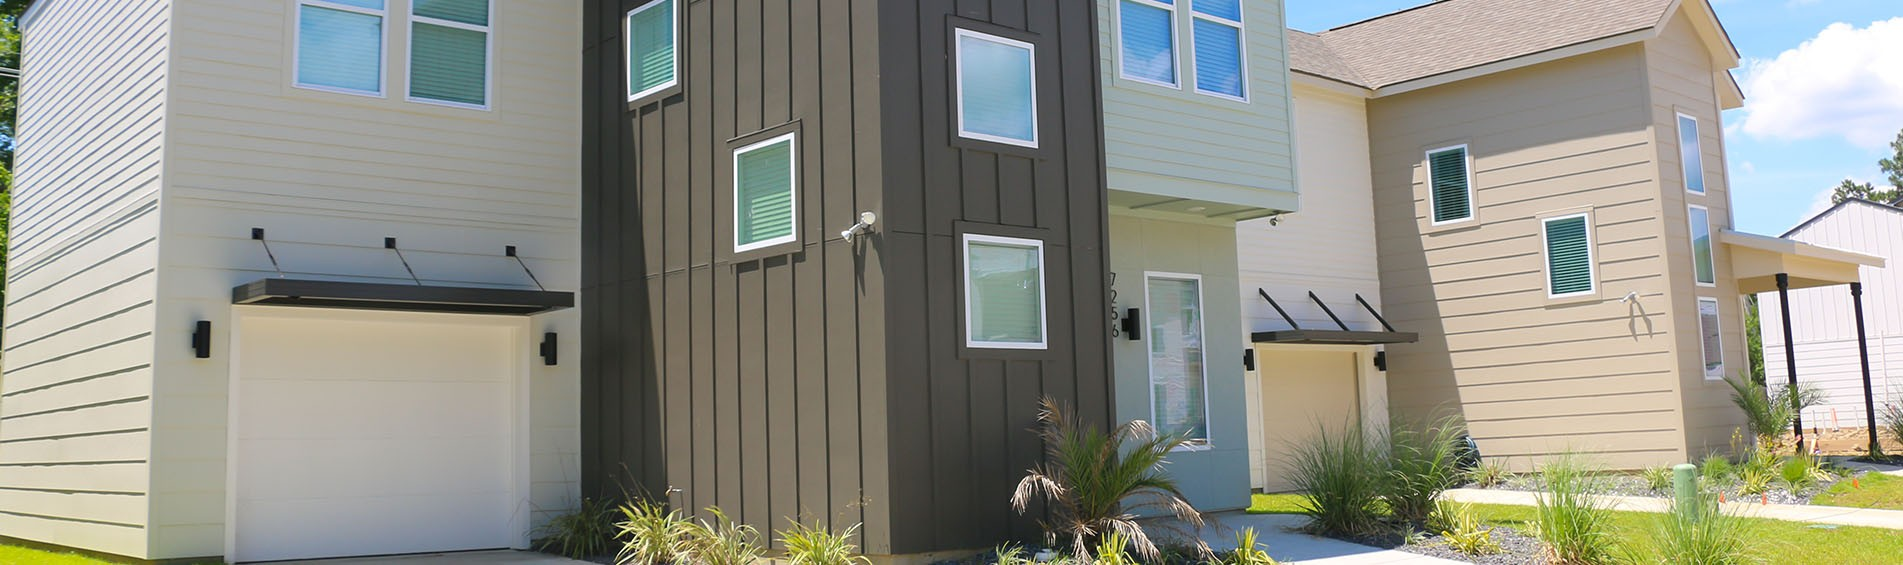 Door Amp Window Replacement New Orleans Strong Shield